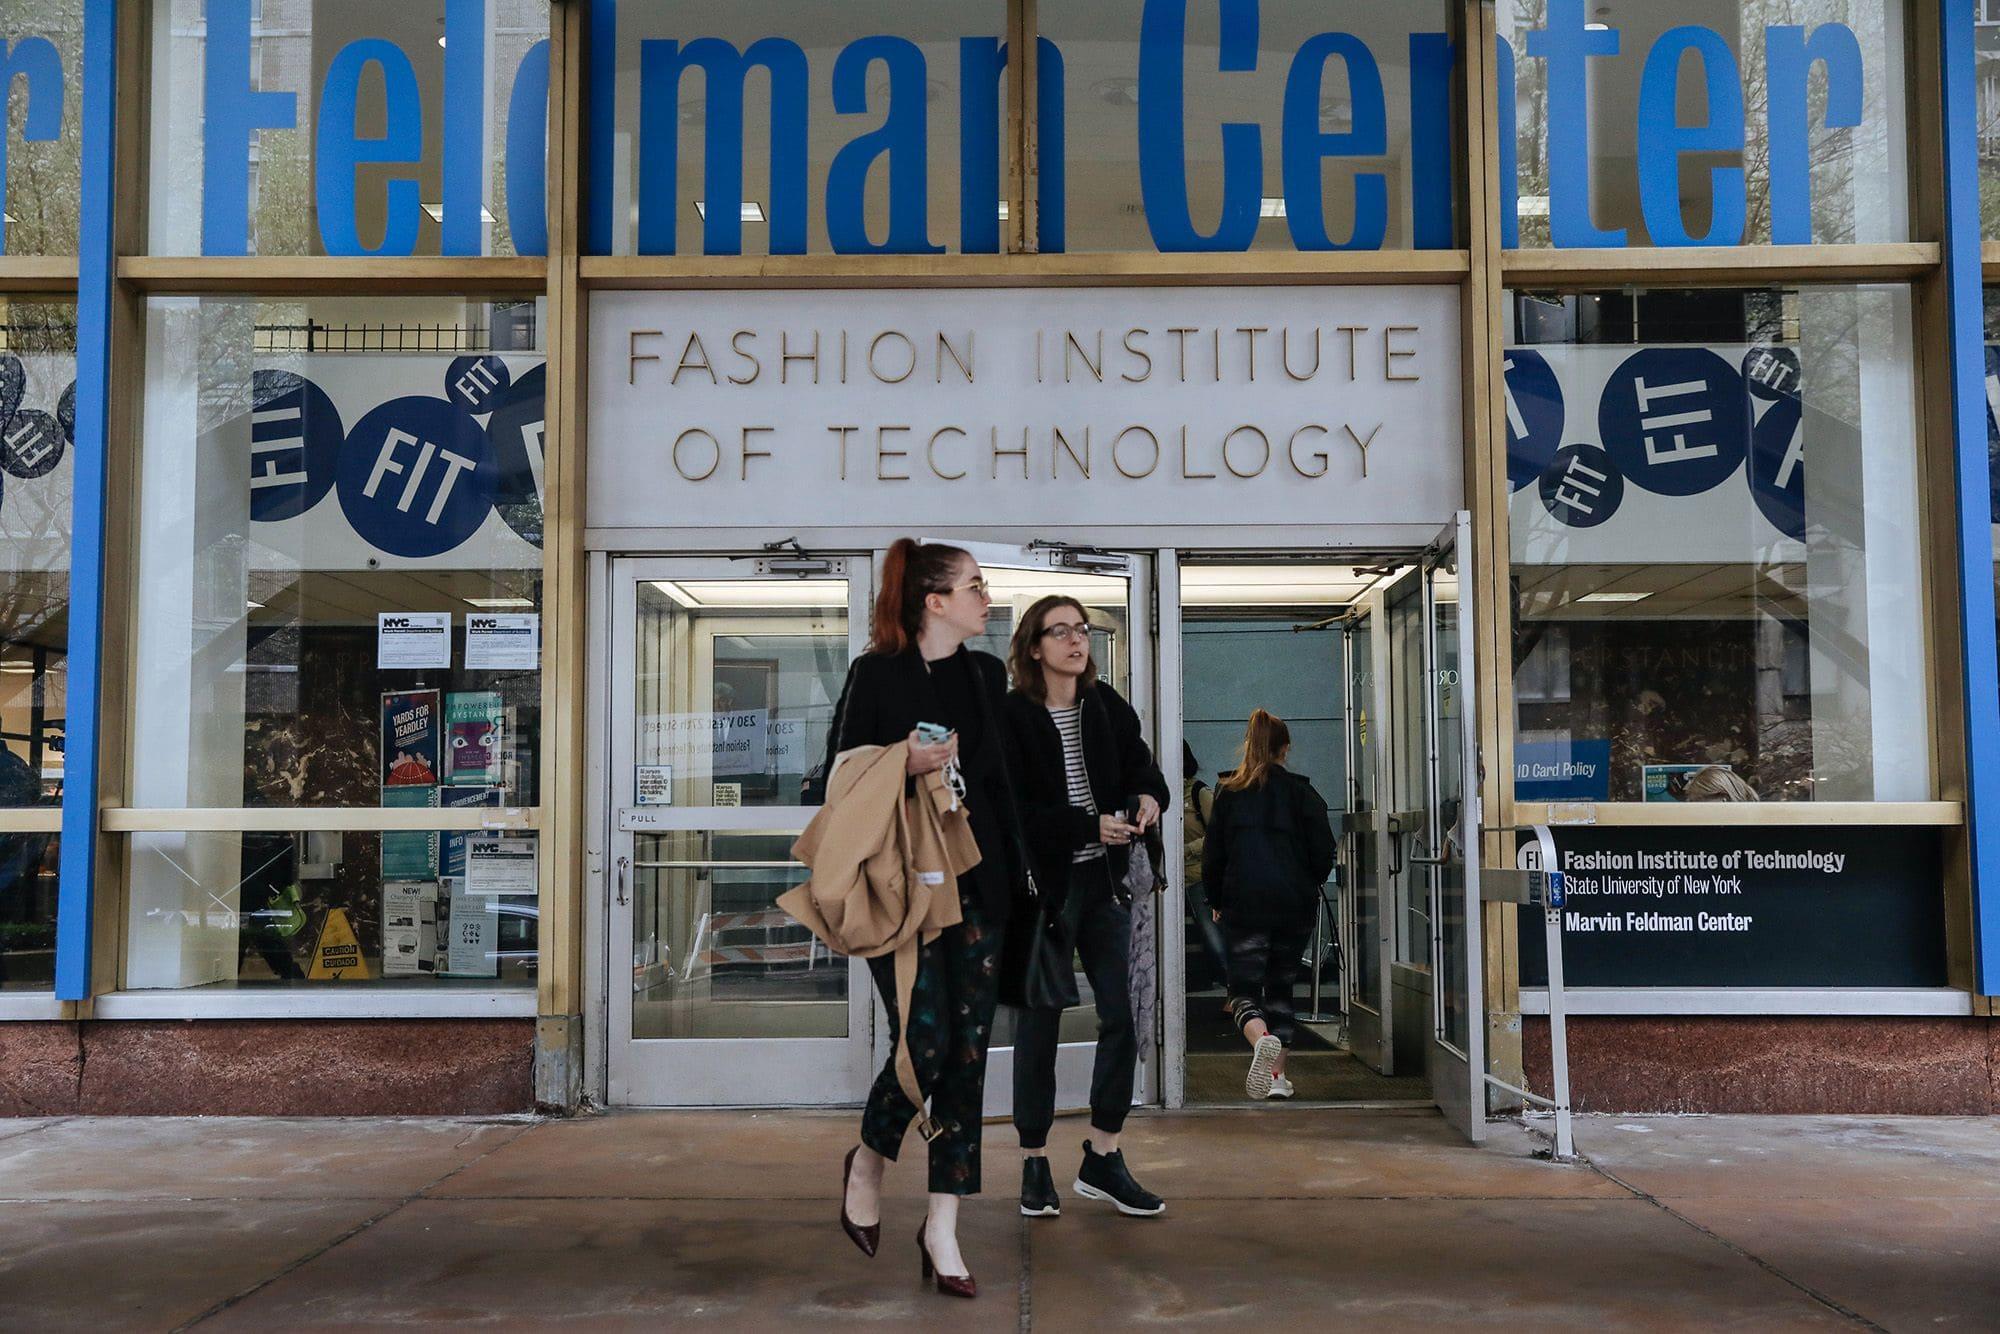 fashion-institute-new-york-visite-gratuite